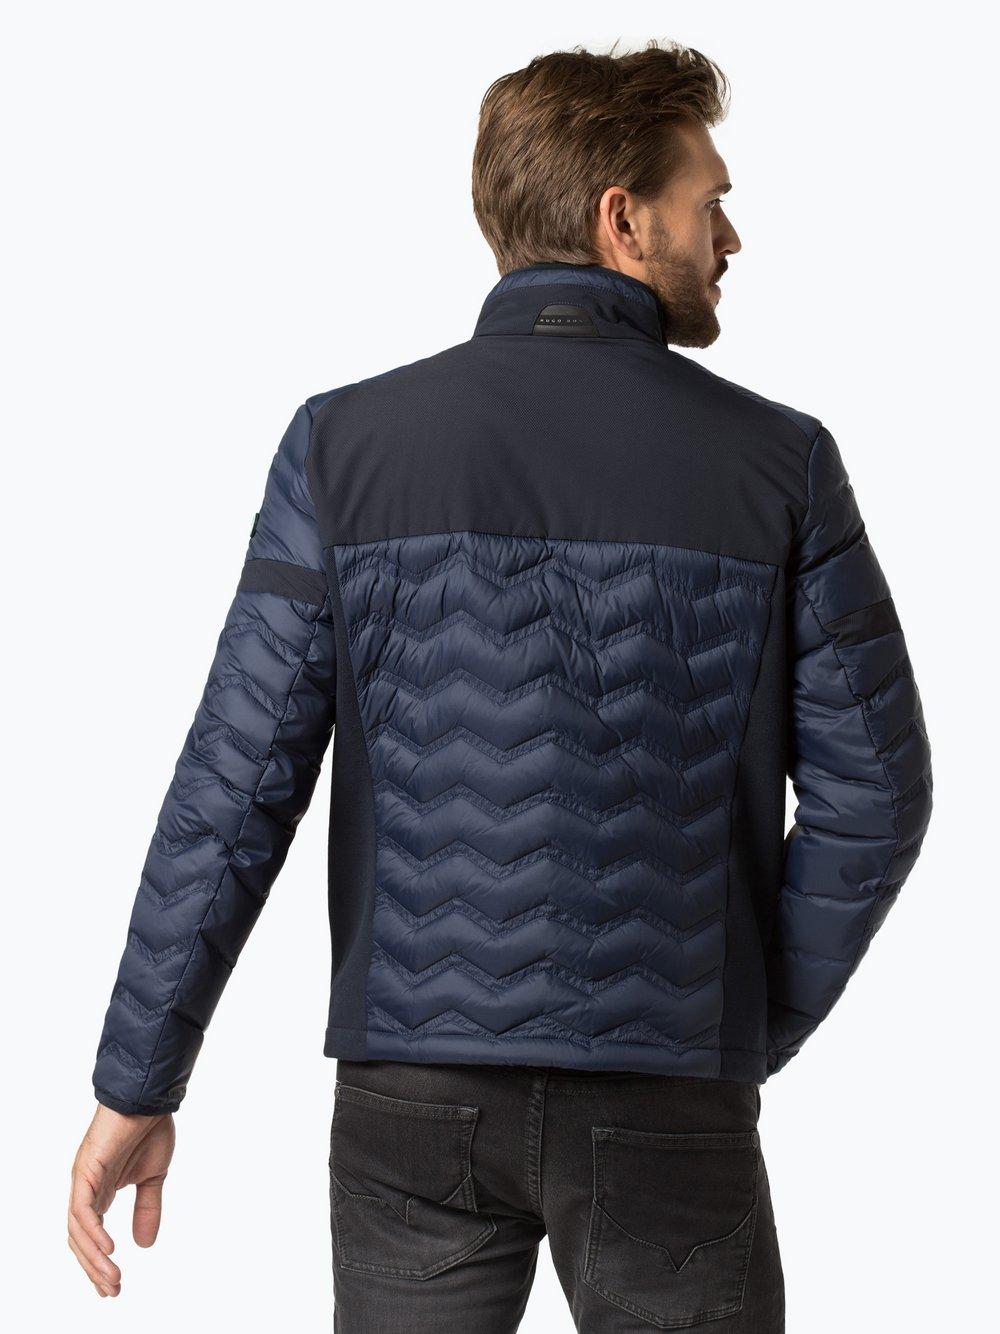 new product 27d75 d847b BOSS Athleisure Herren Daunenjacke - Jei online kaufen ...